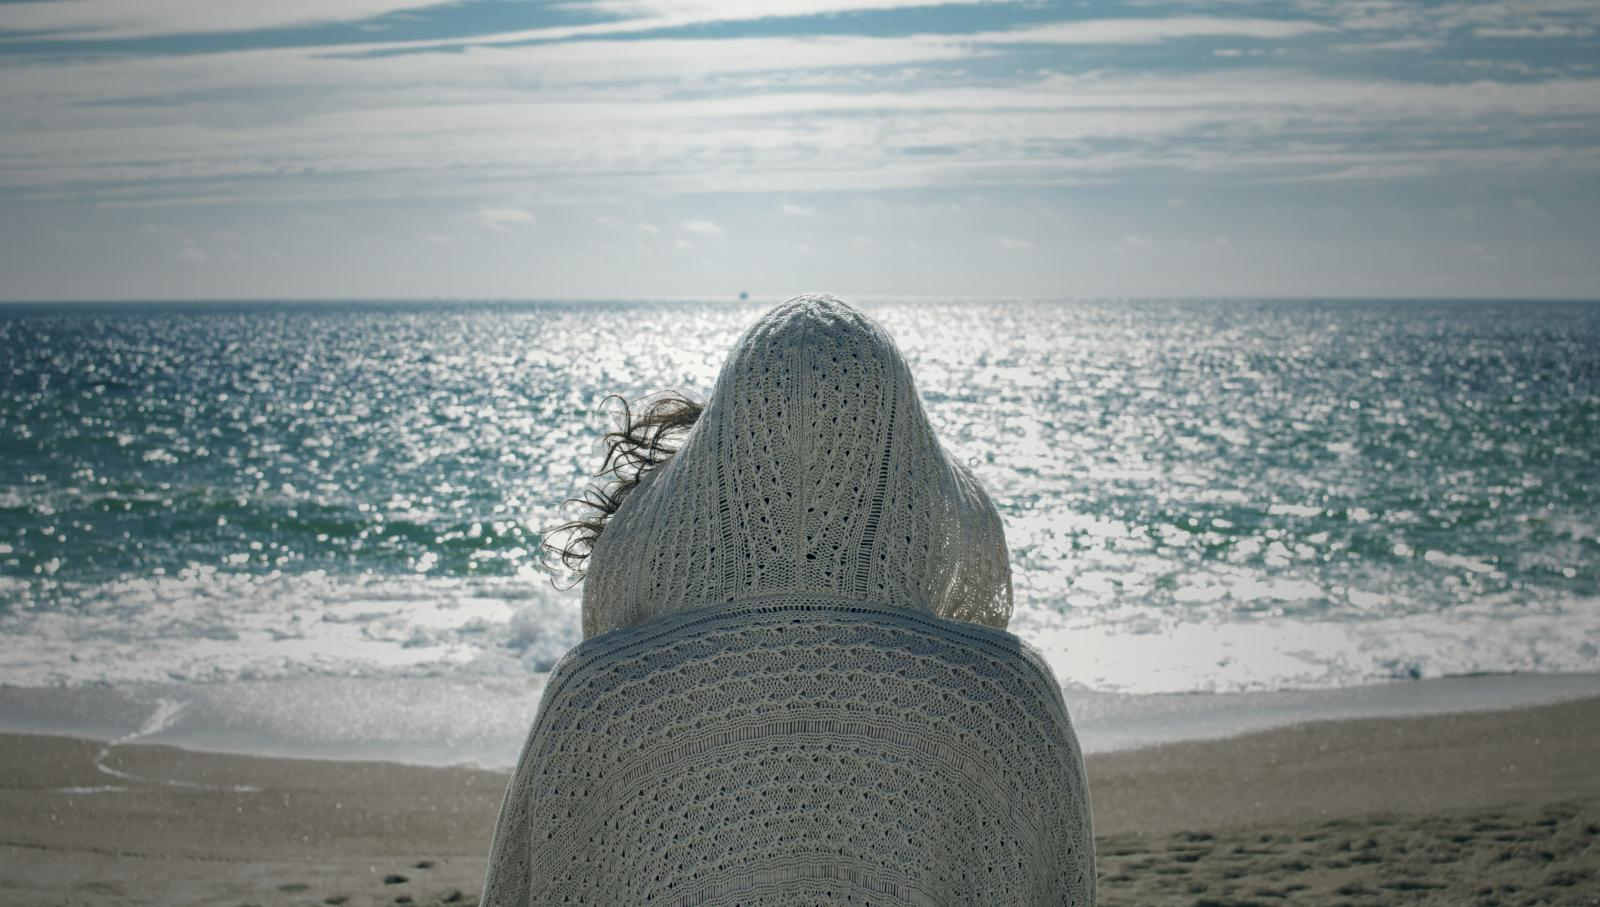 Život se ne bi trebao odrađivati, život bi se trebao živjeti... Zastanite na trenutak i zapitajte se živite li život kakav želite...